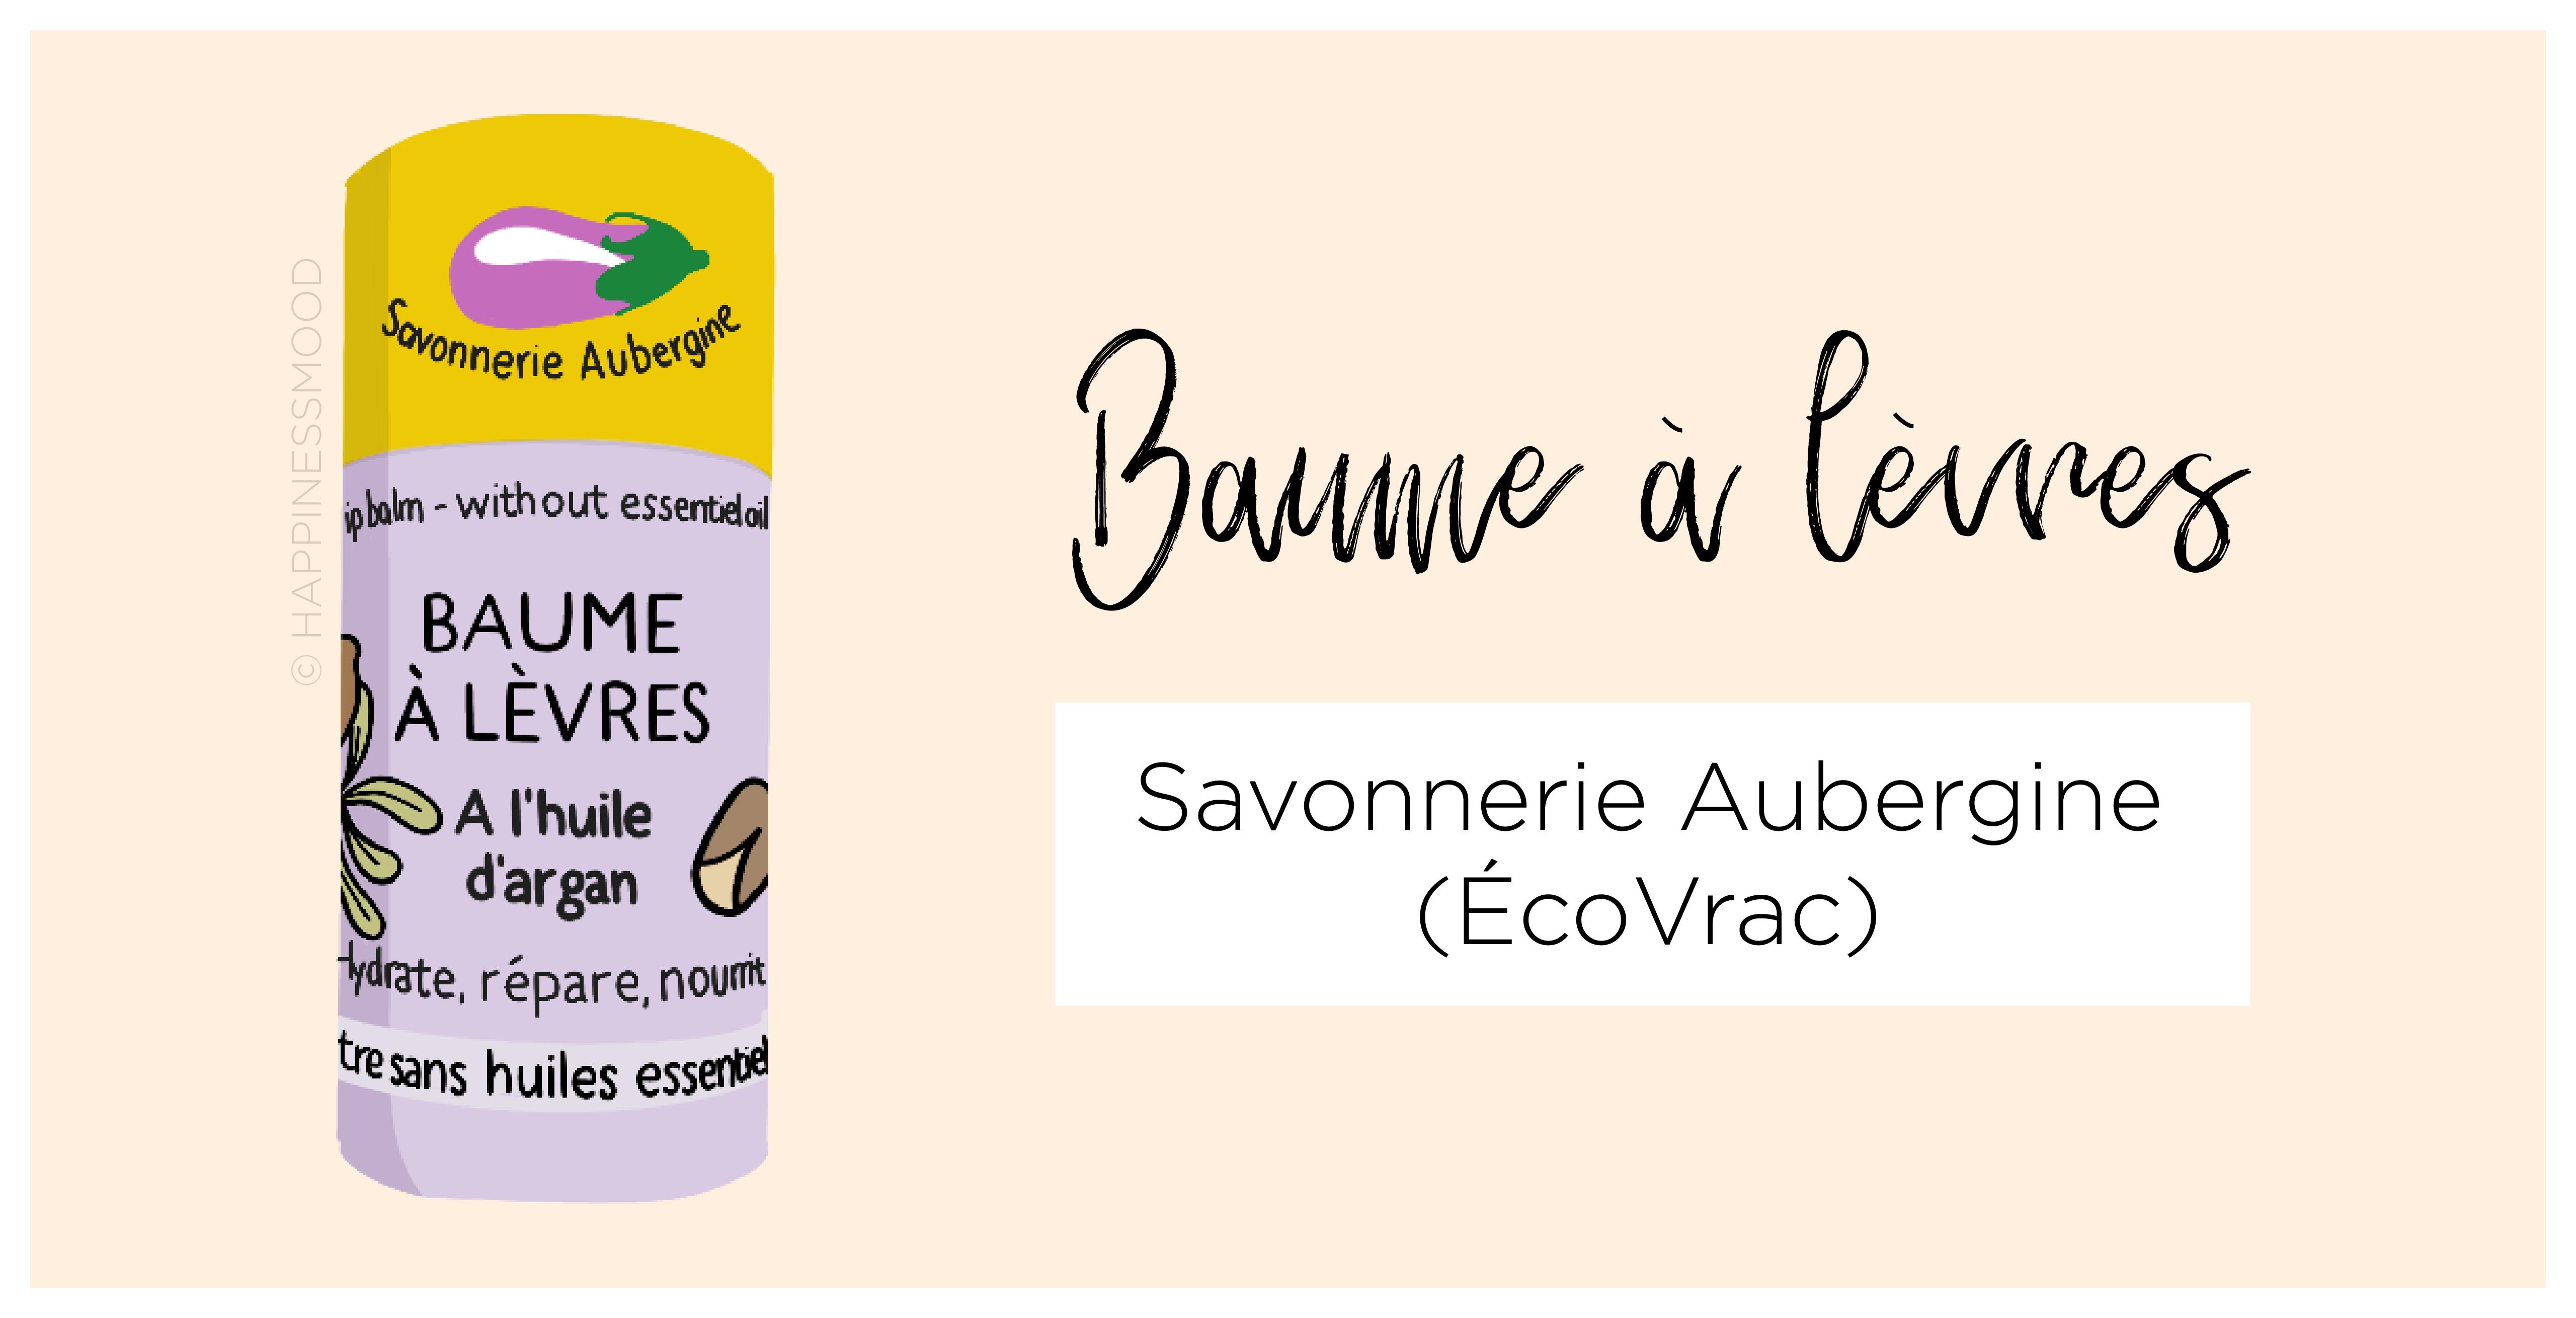 Baume a levres Savonnerie Aubergine EcoVrac Mulhouse